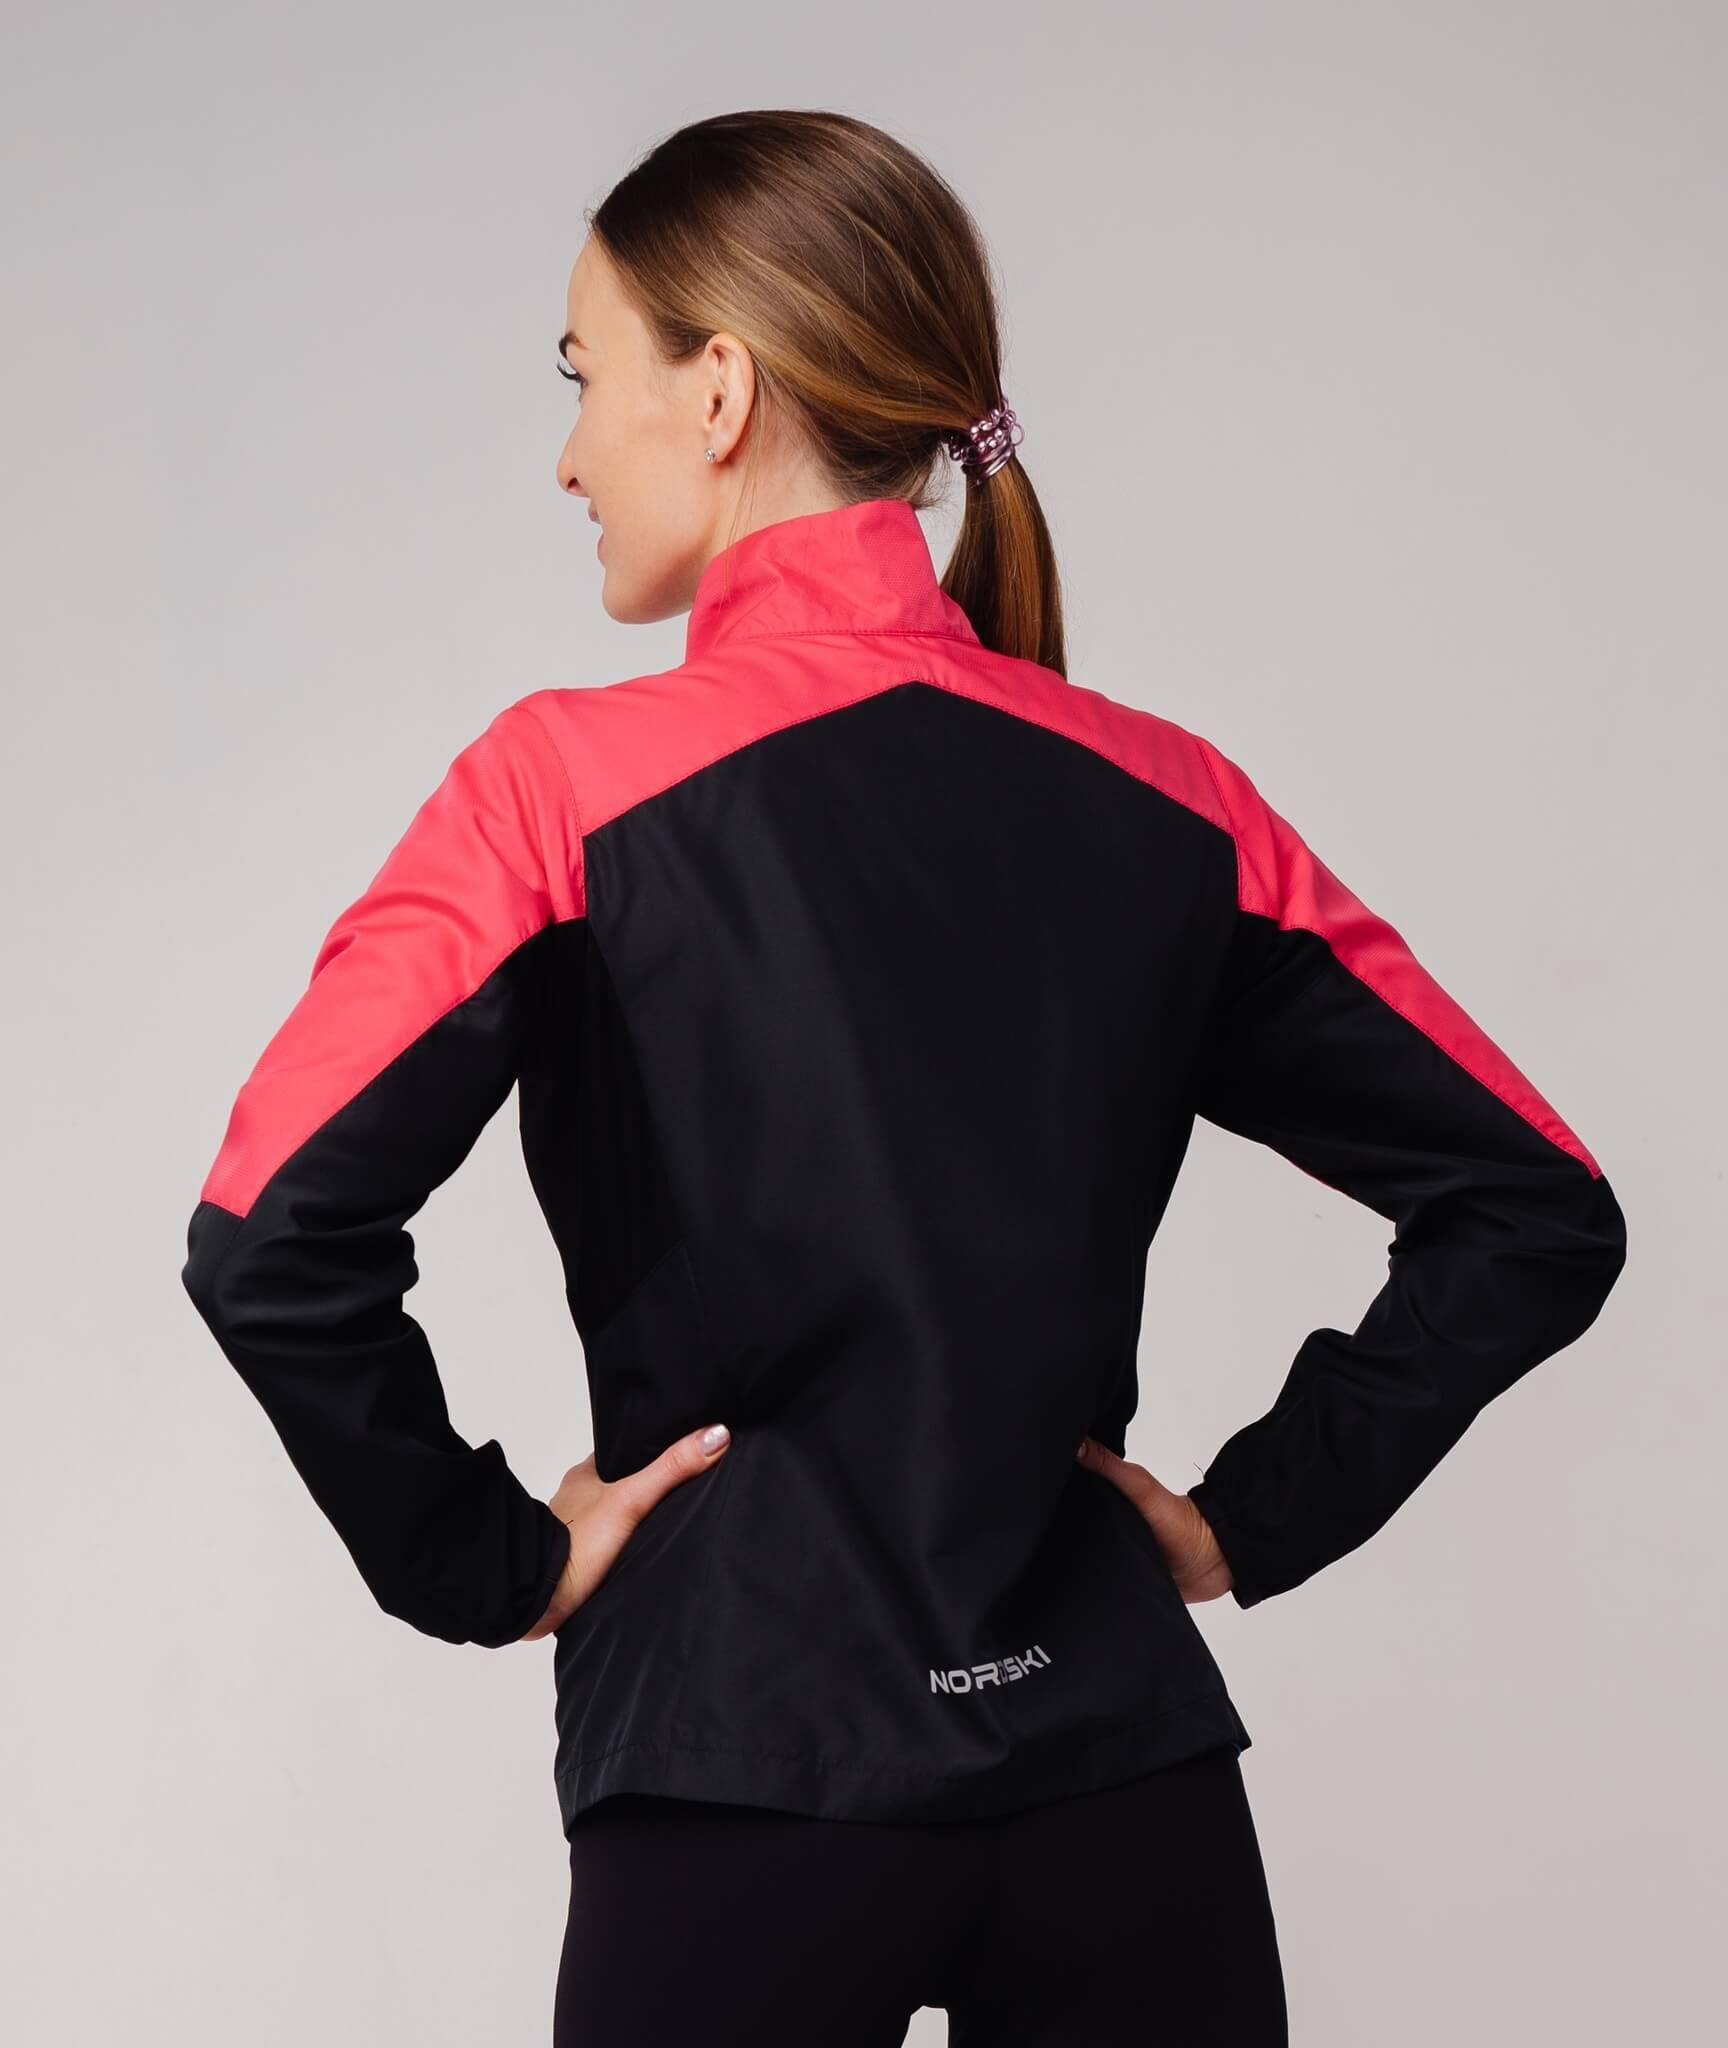 Nordski Sport костюм для бега женский pink-black - 2